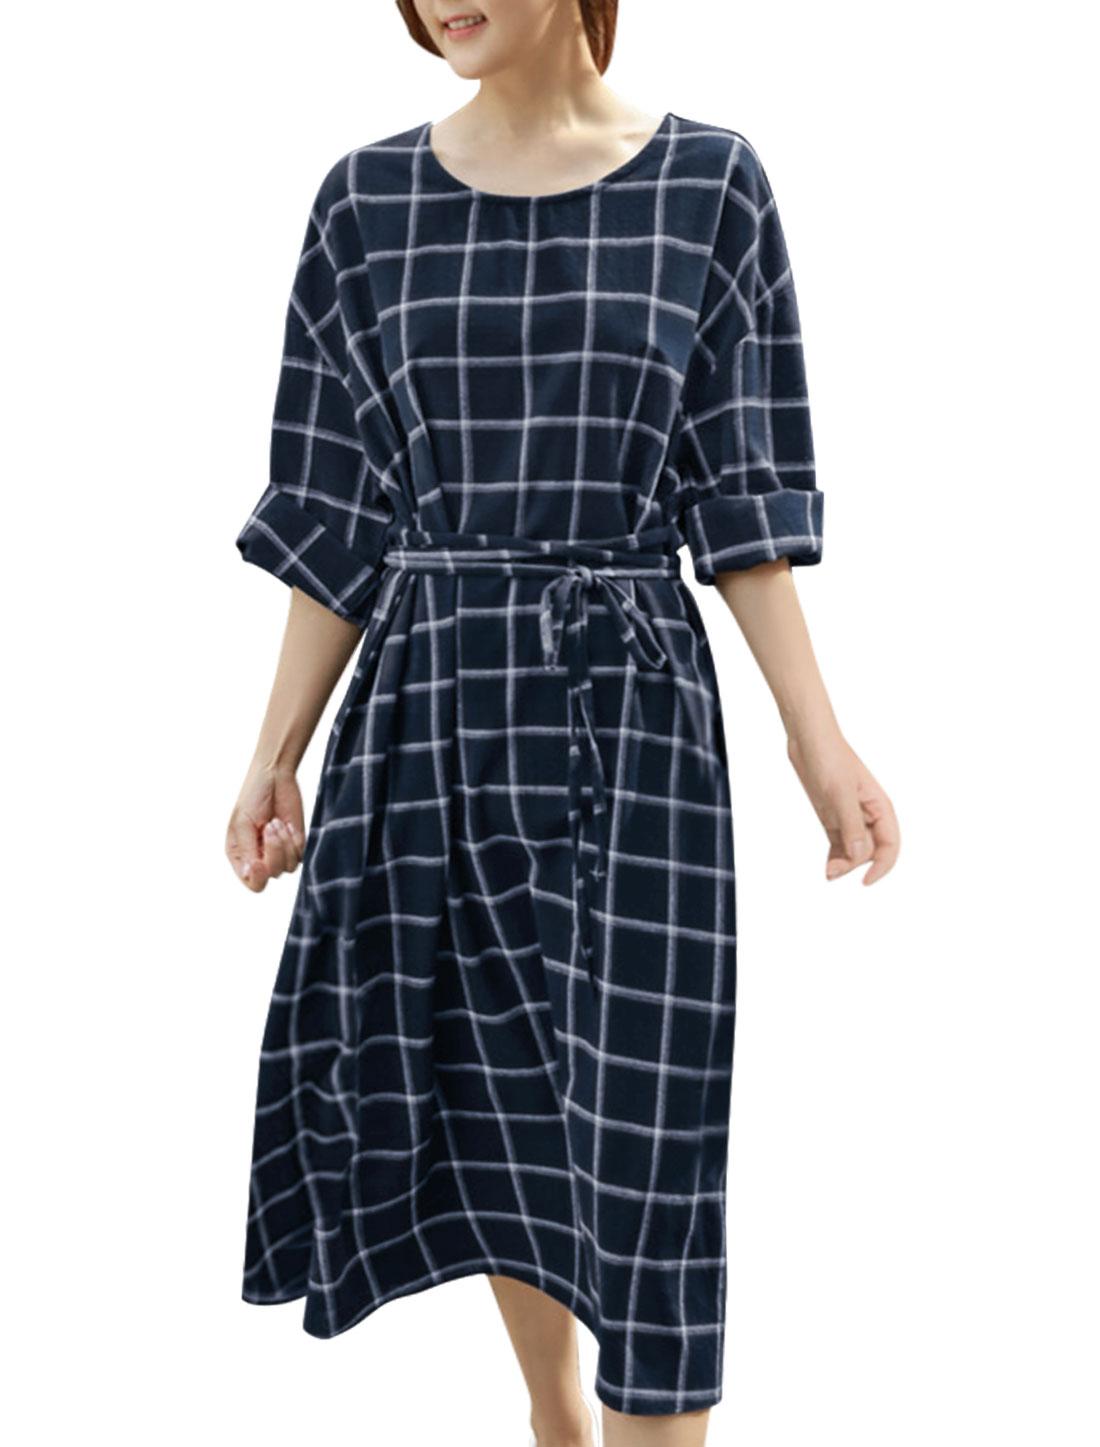 Women-Round-Neck-Kimono-Sleeves-Checks-Loose-A-Line-Dress-w-Belt